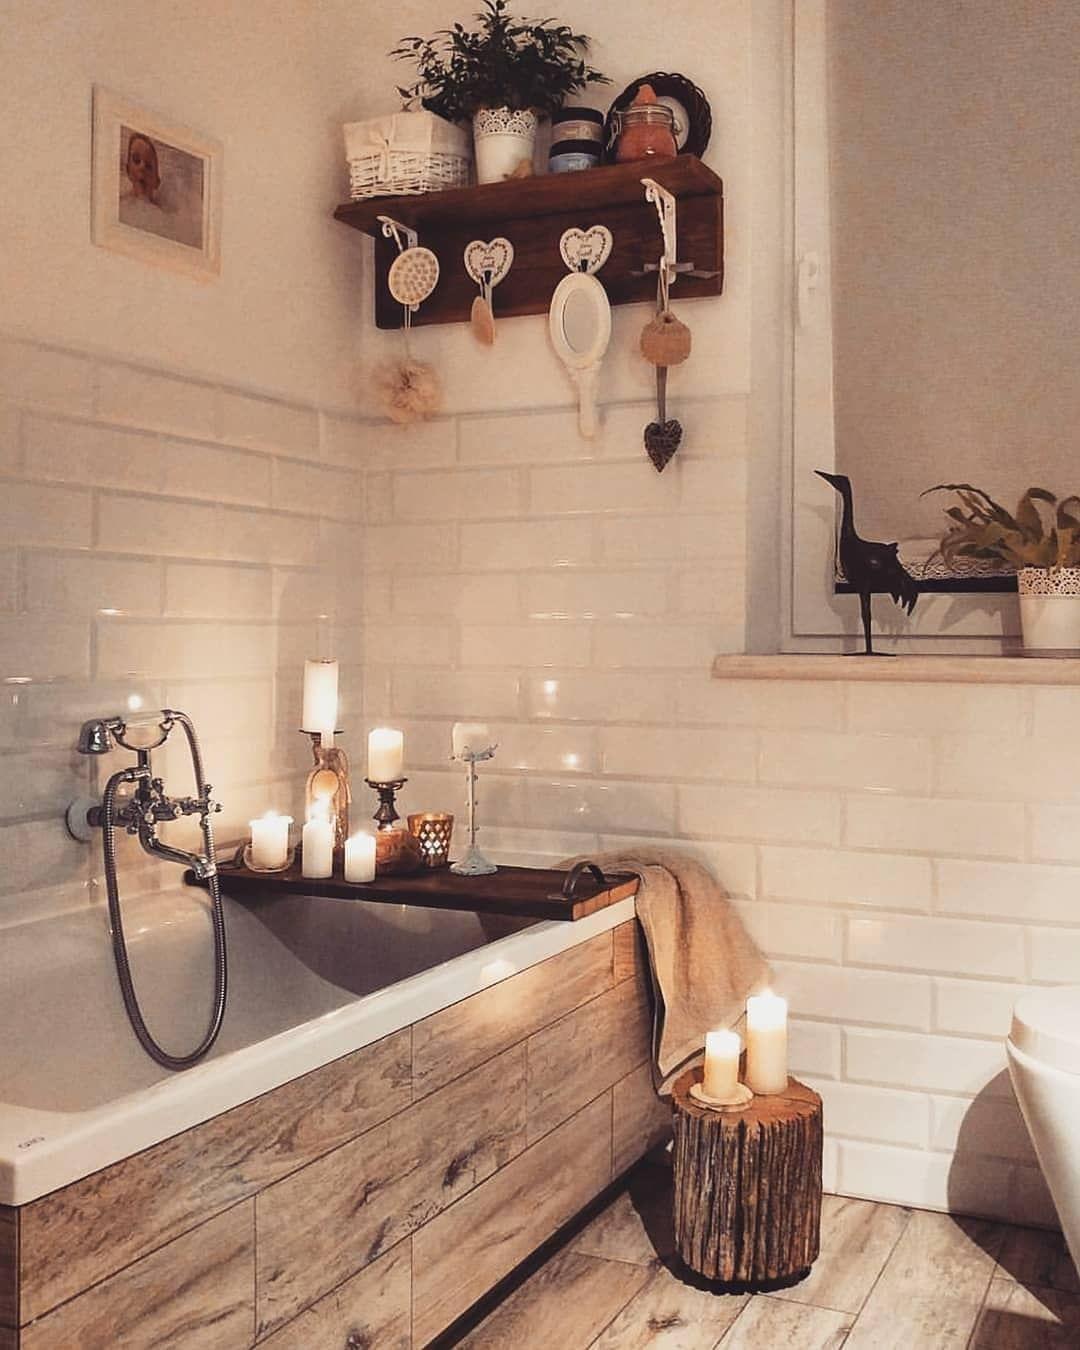 Relaxation salle de bain baignoire bois bougies Marque de robinetterie salle de bain